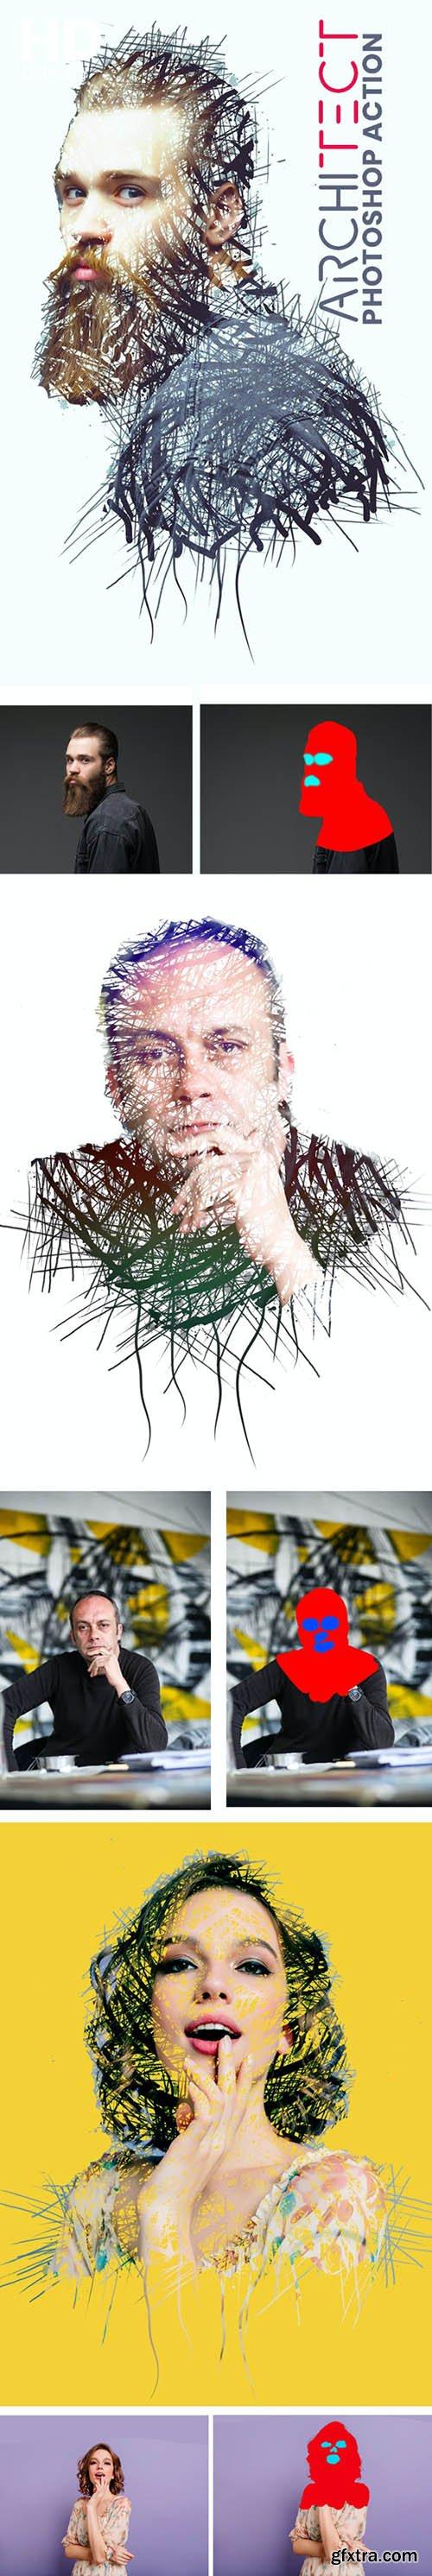 GraphicRiver - Architect Photoshop Action 31024650